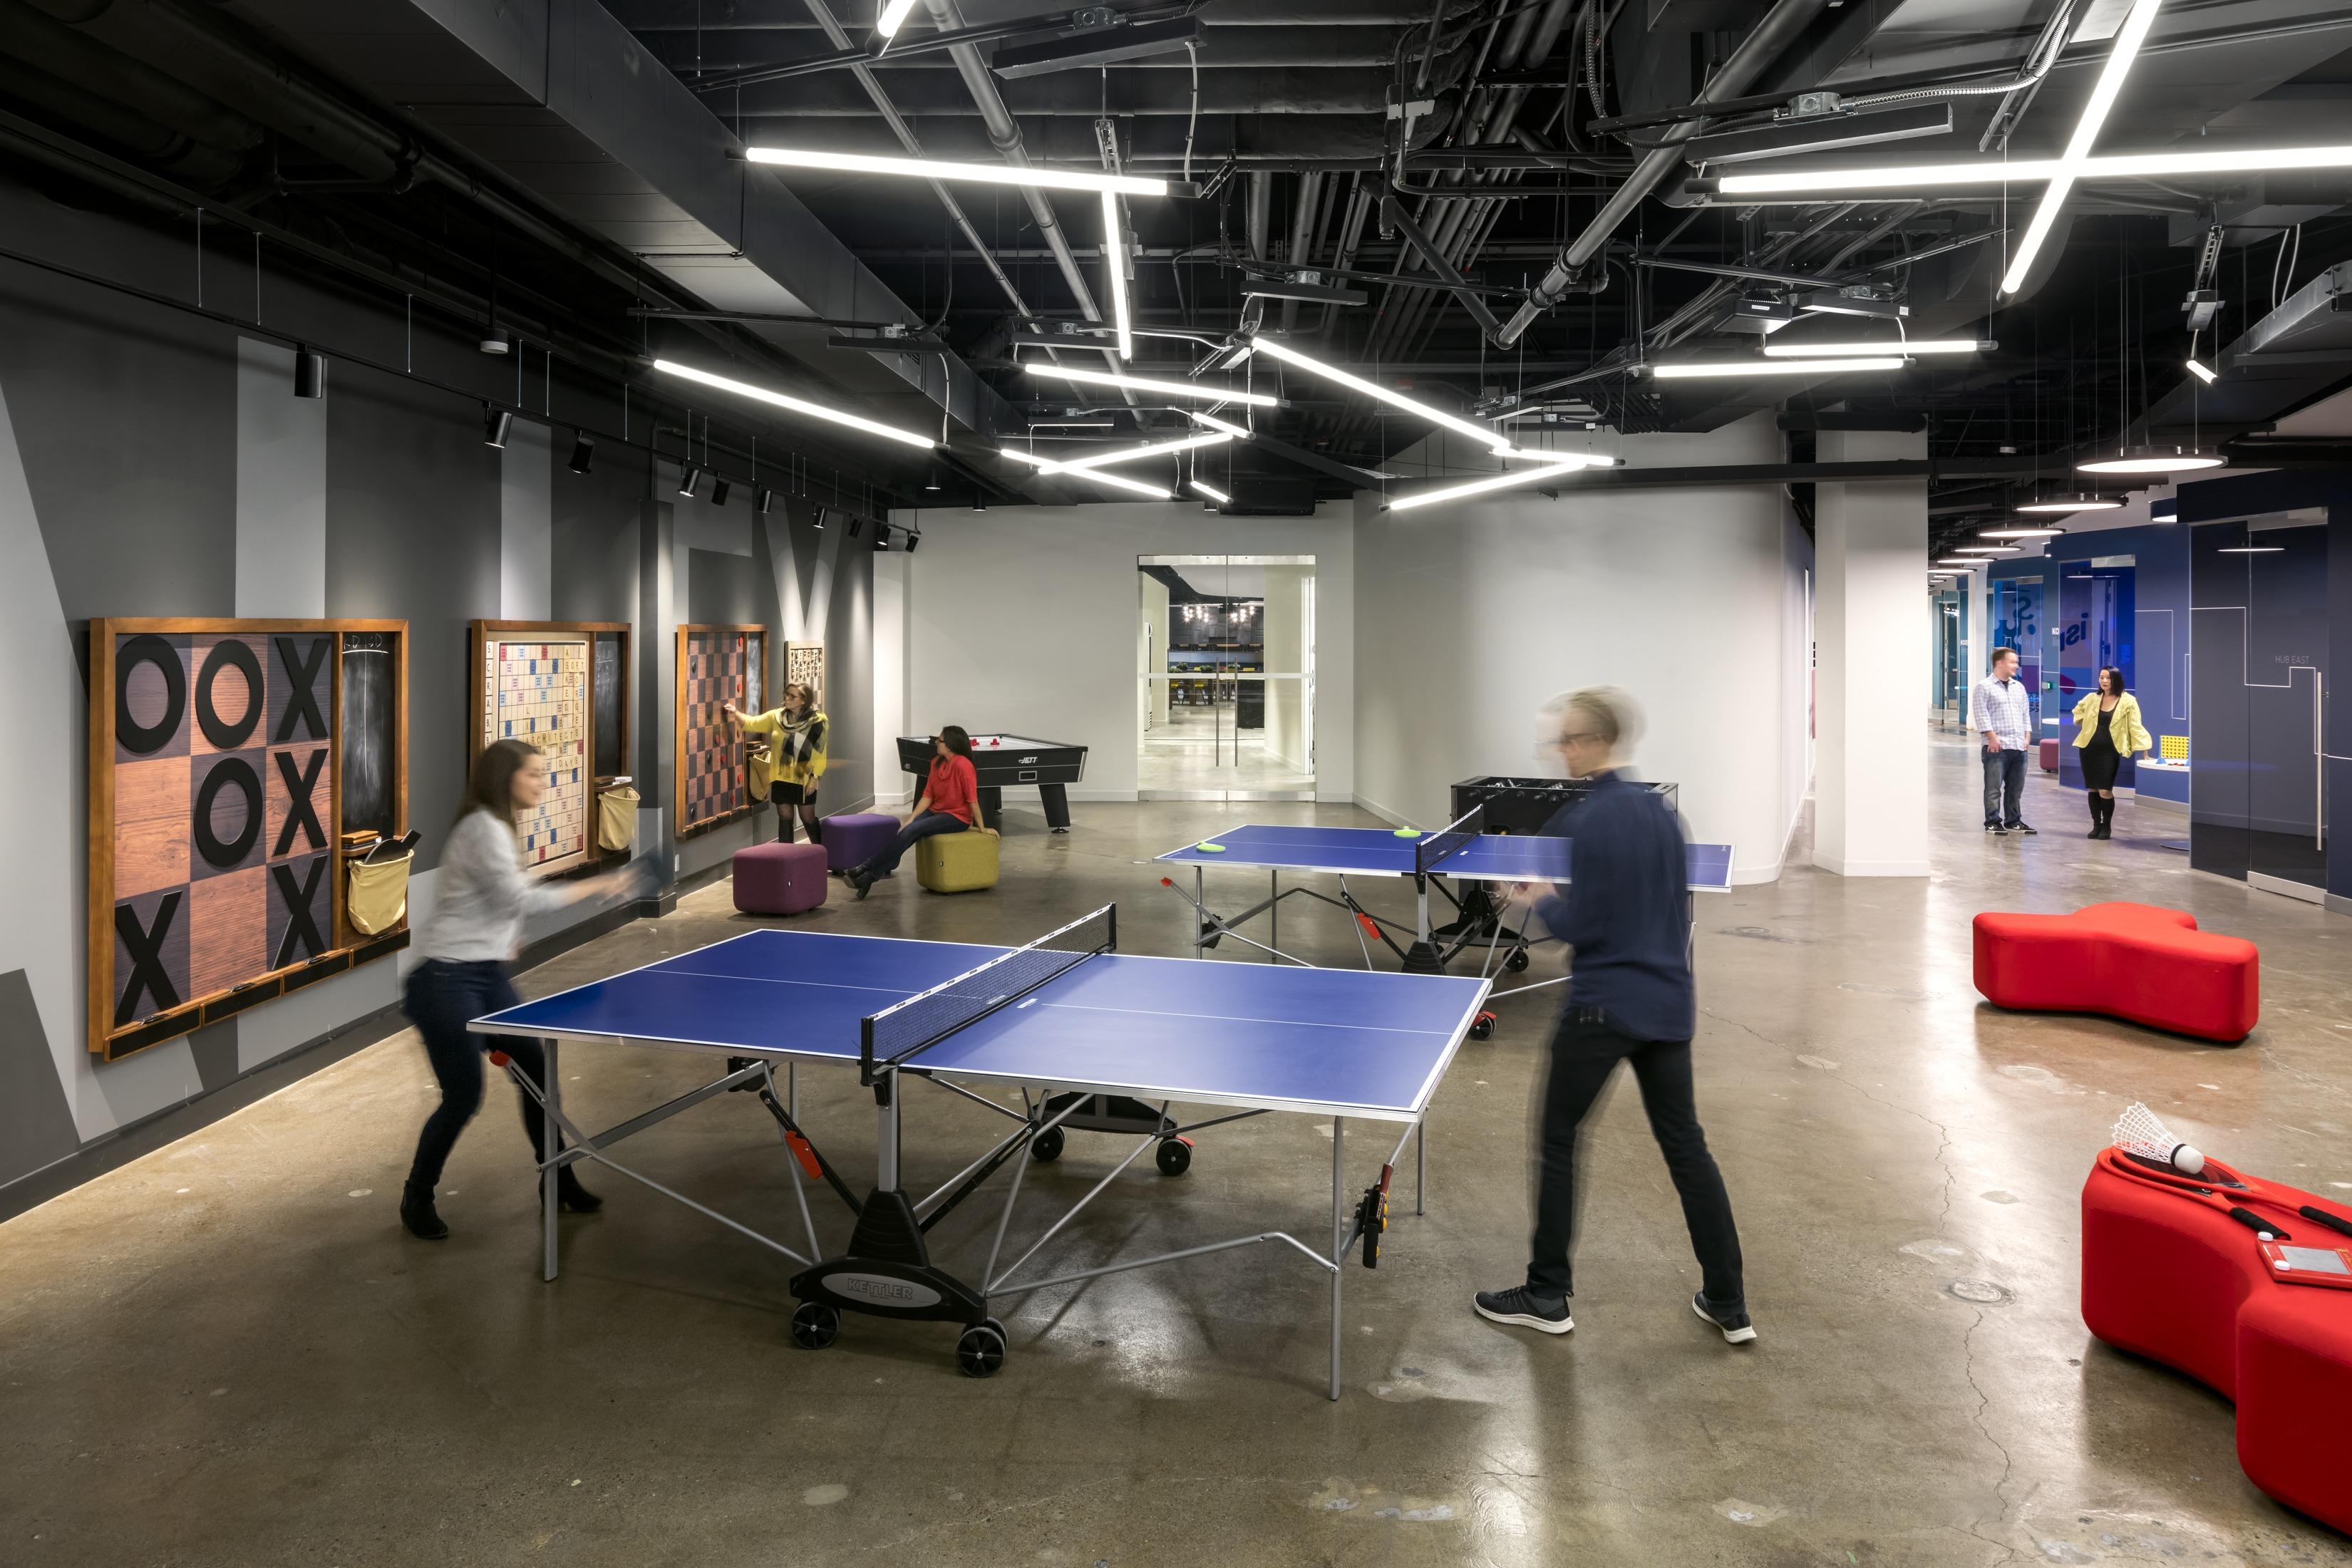 Games room at Scotiabank Digital Factory